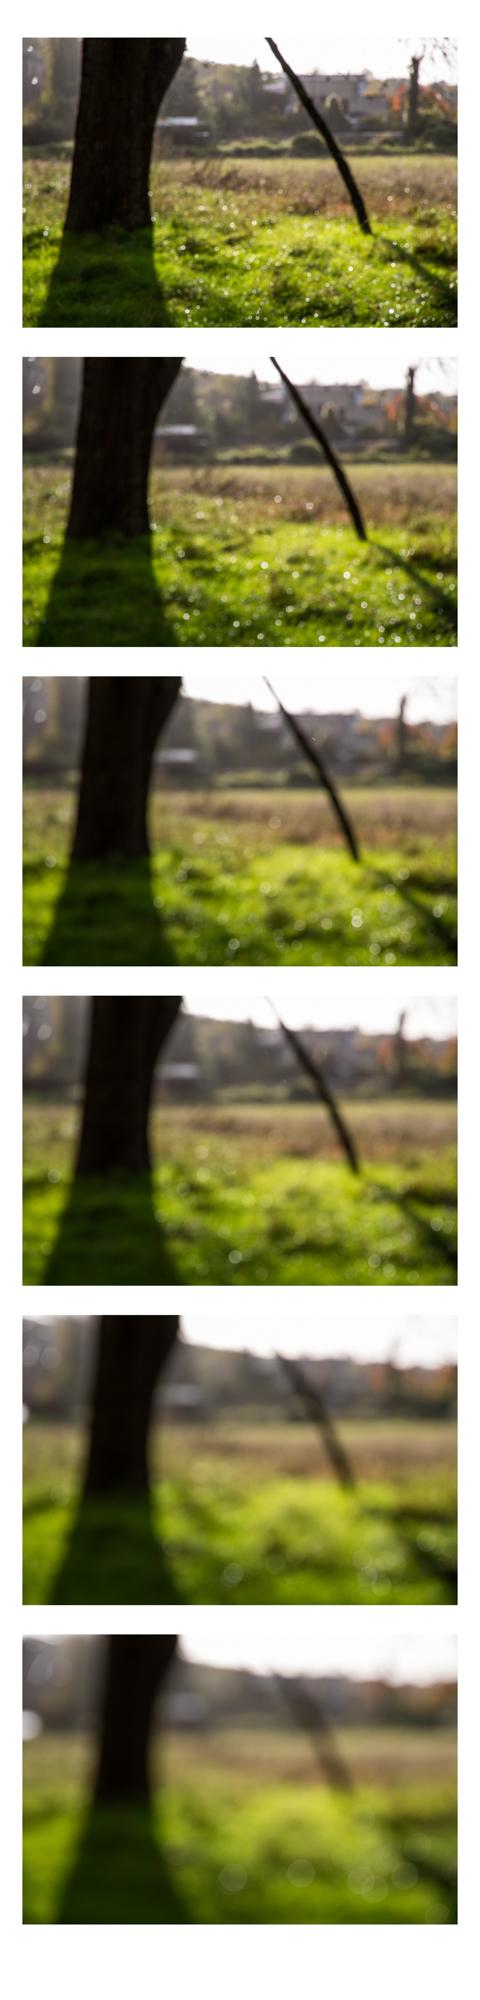 out focus 5.jpg